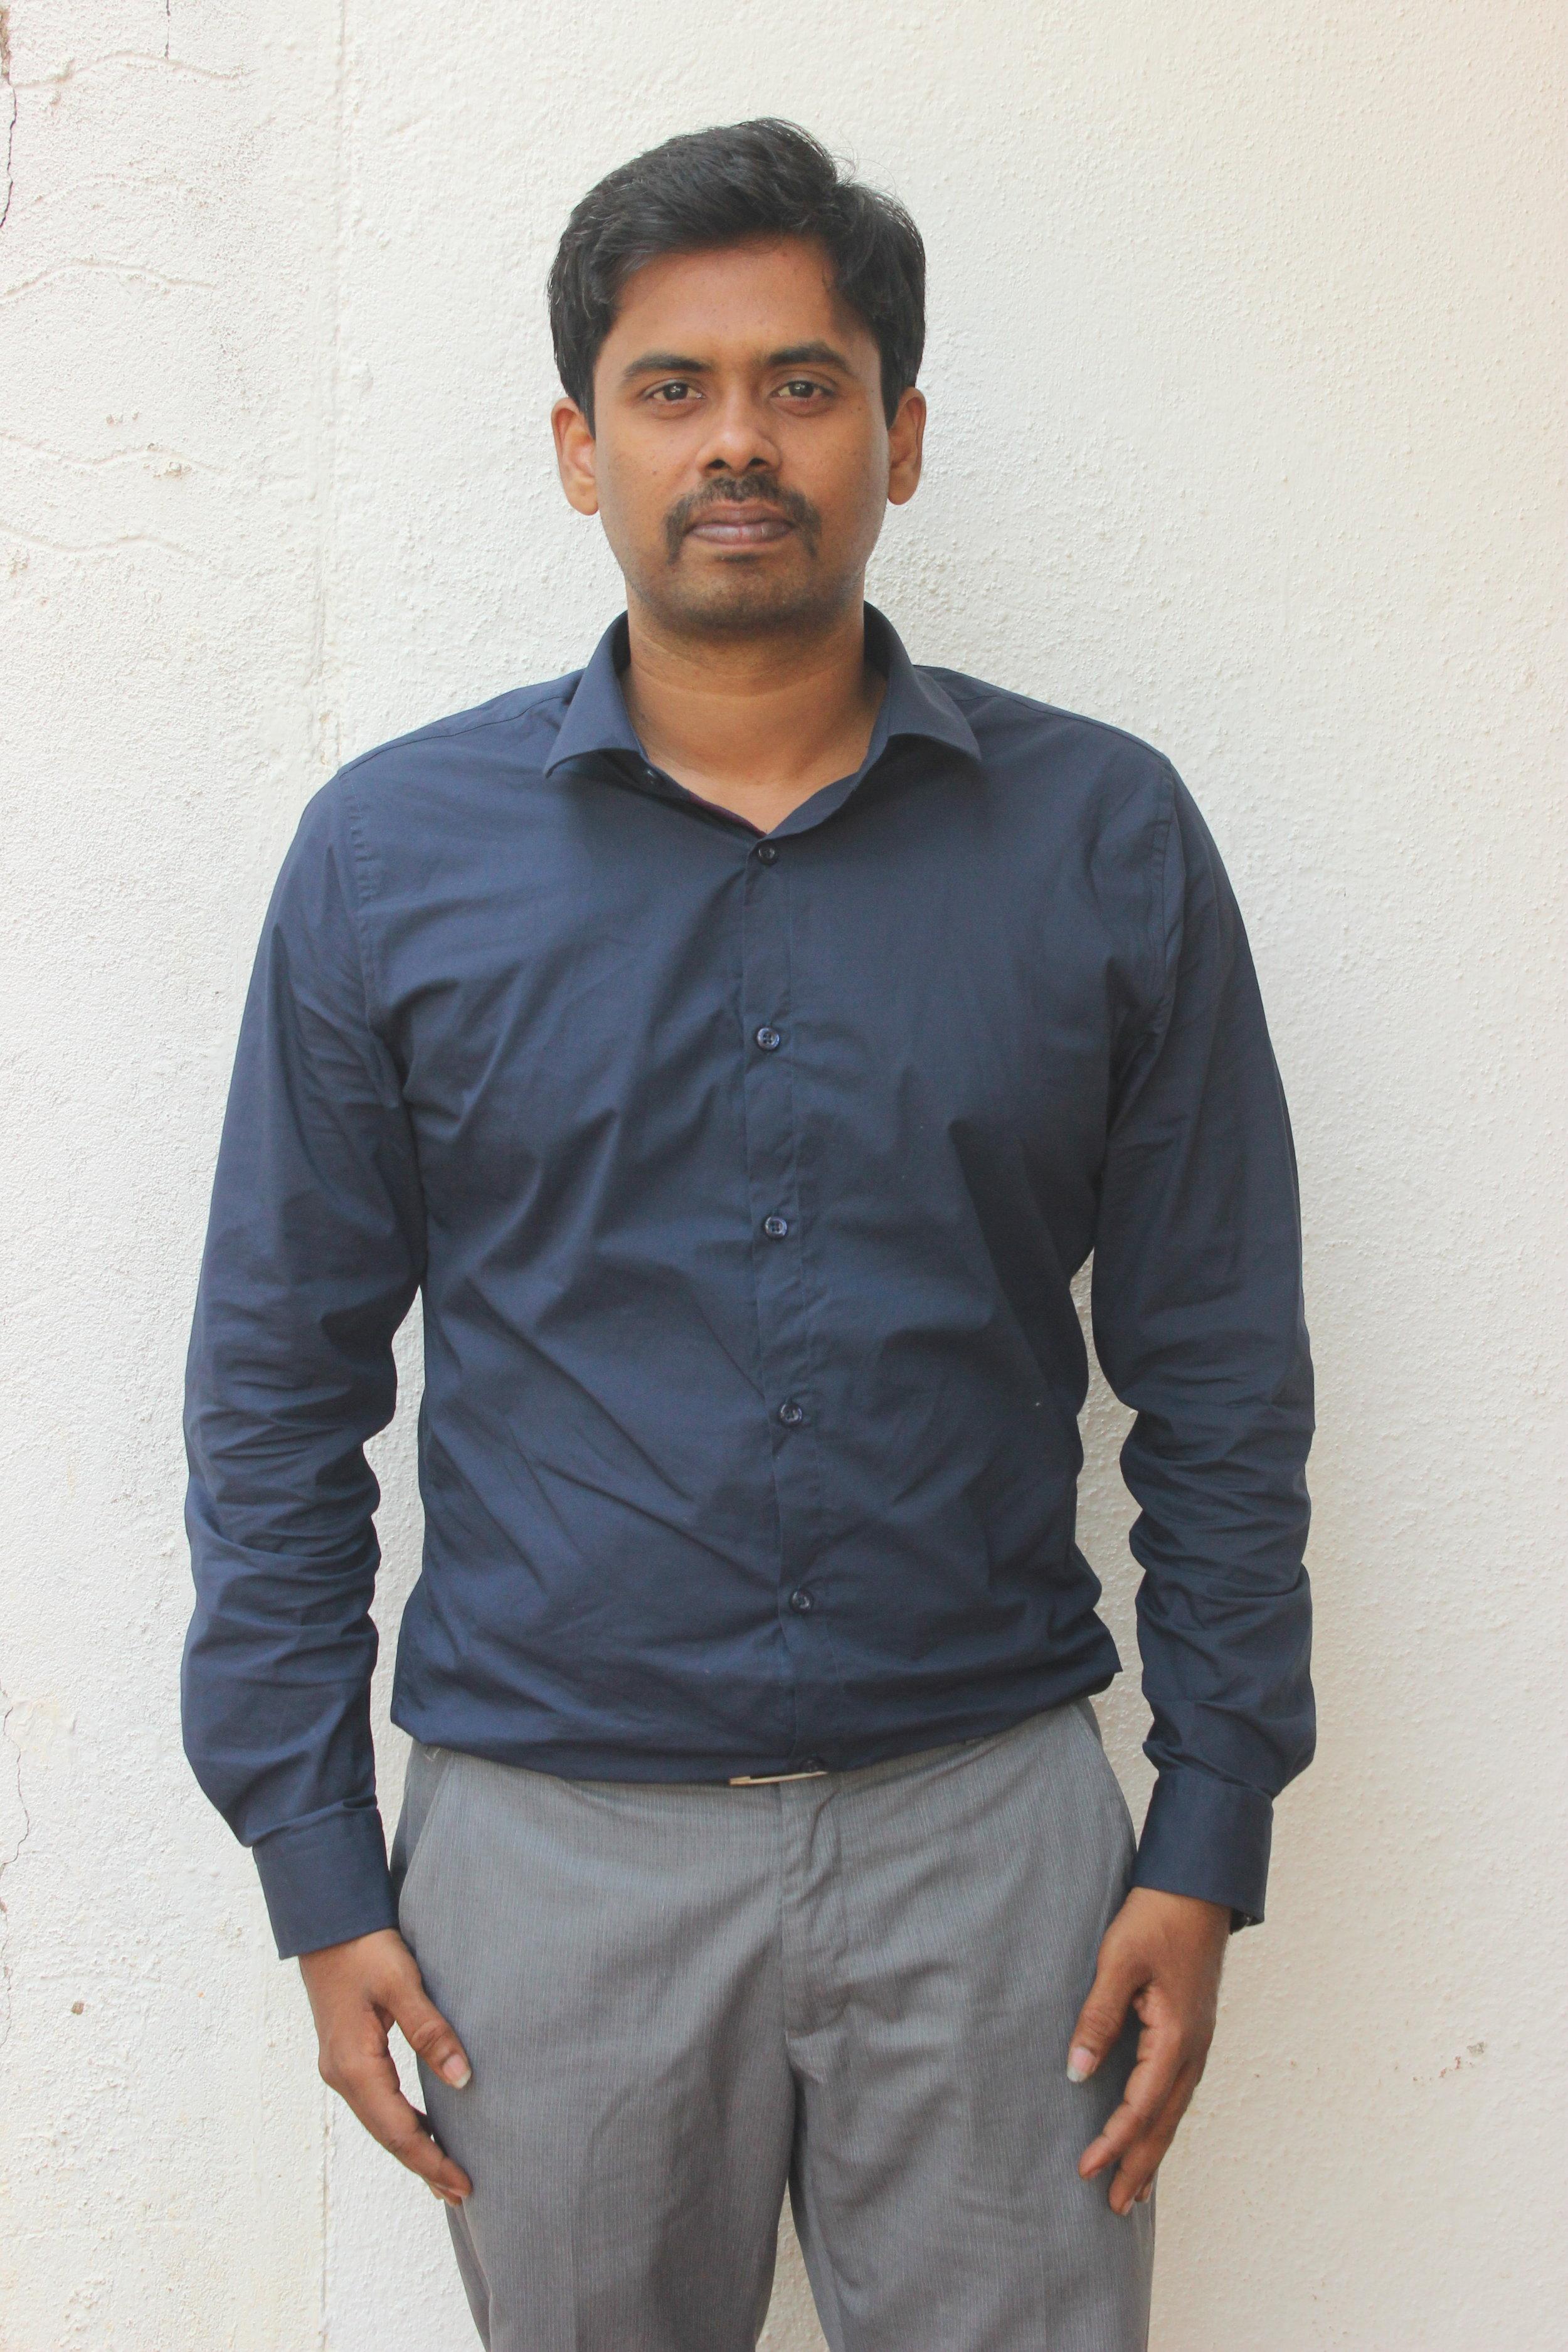 Dr. P. Praveen Kumar, M.Com., MBA., PhD.